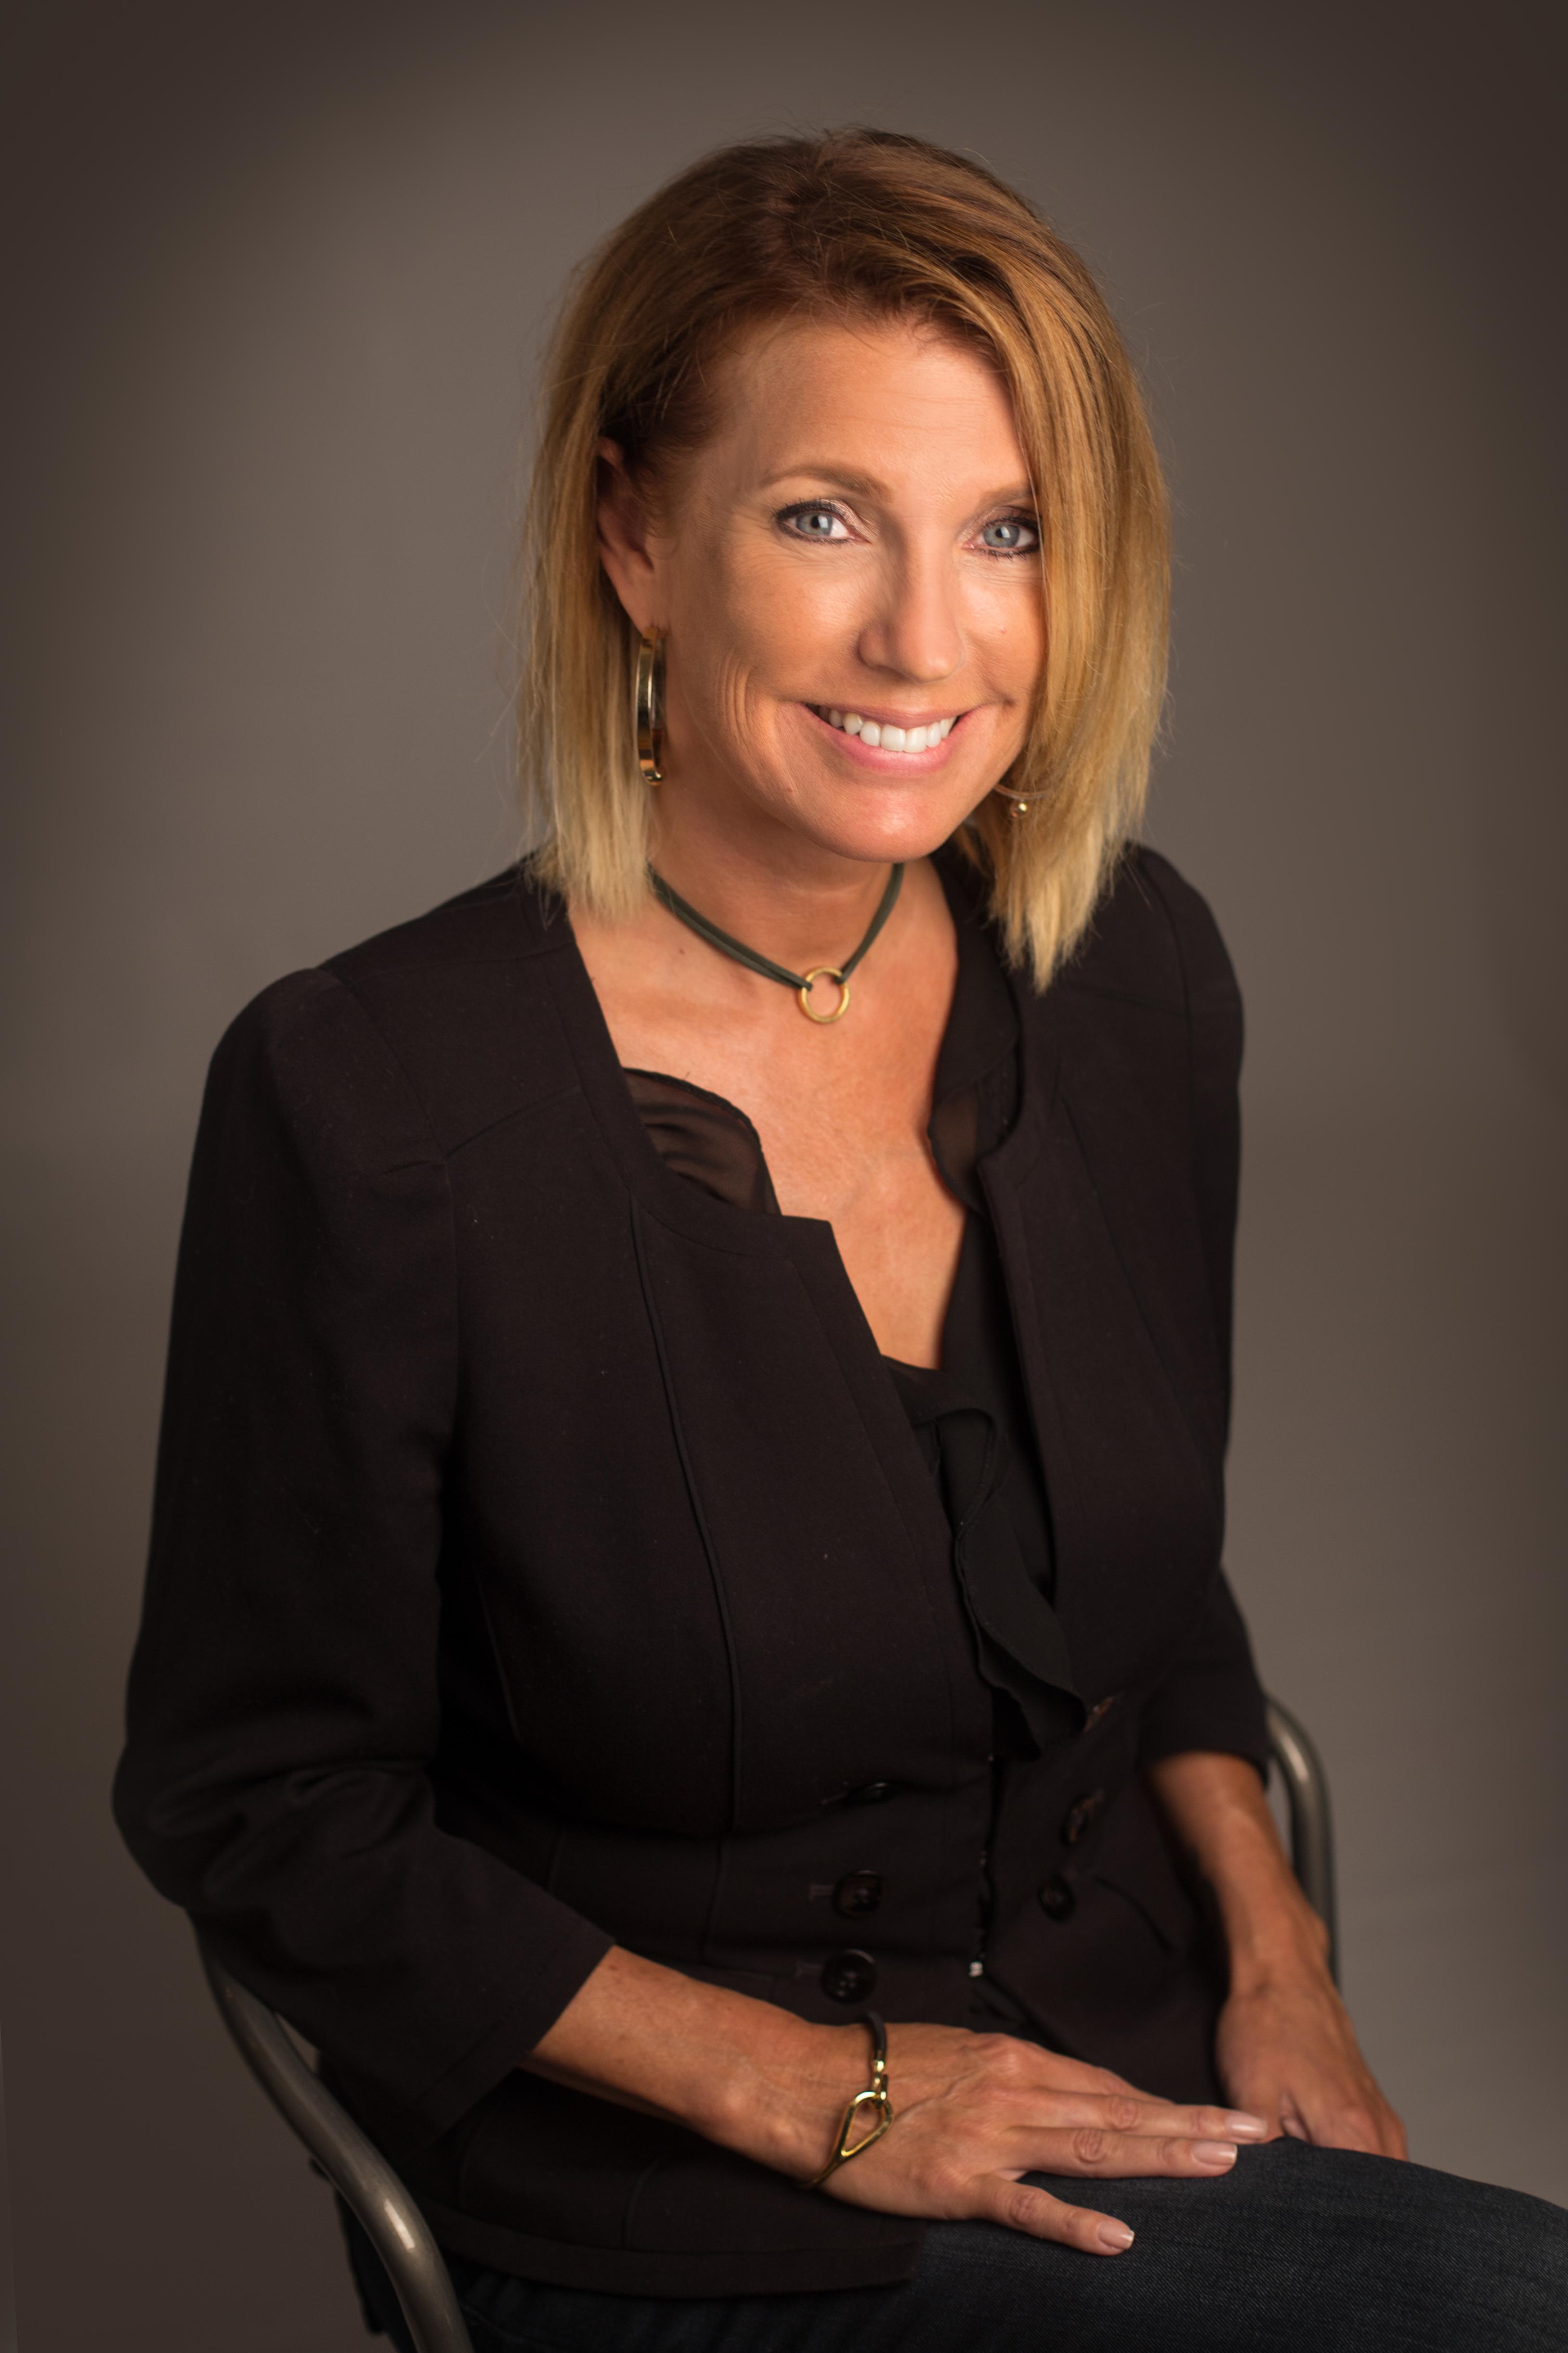 Stacey McVey